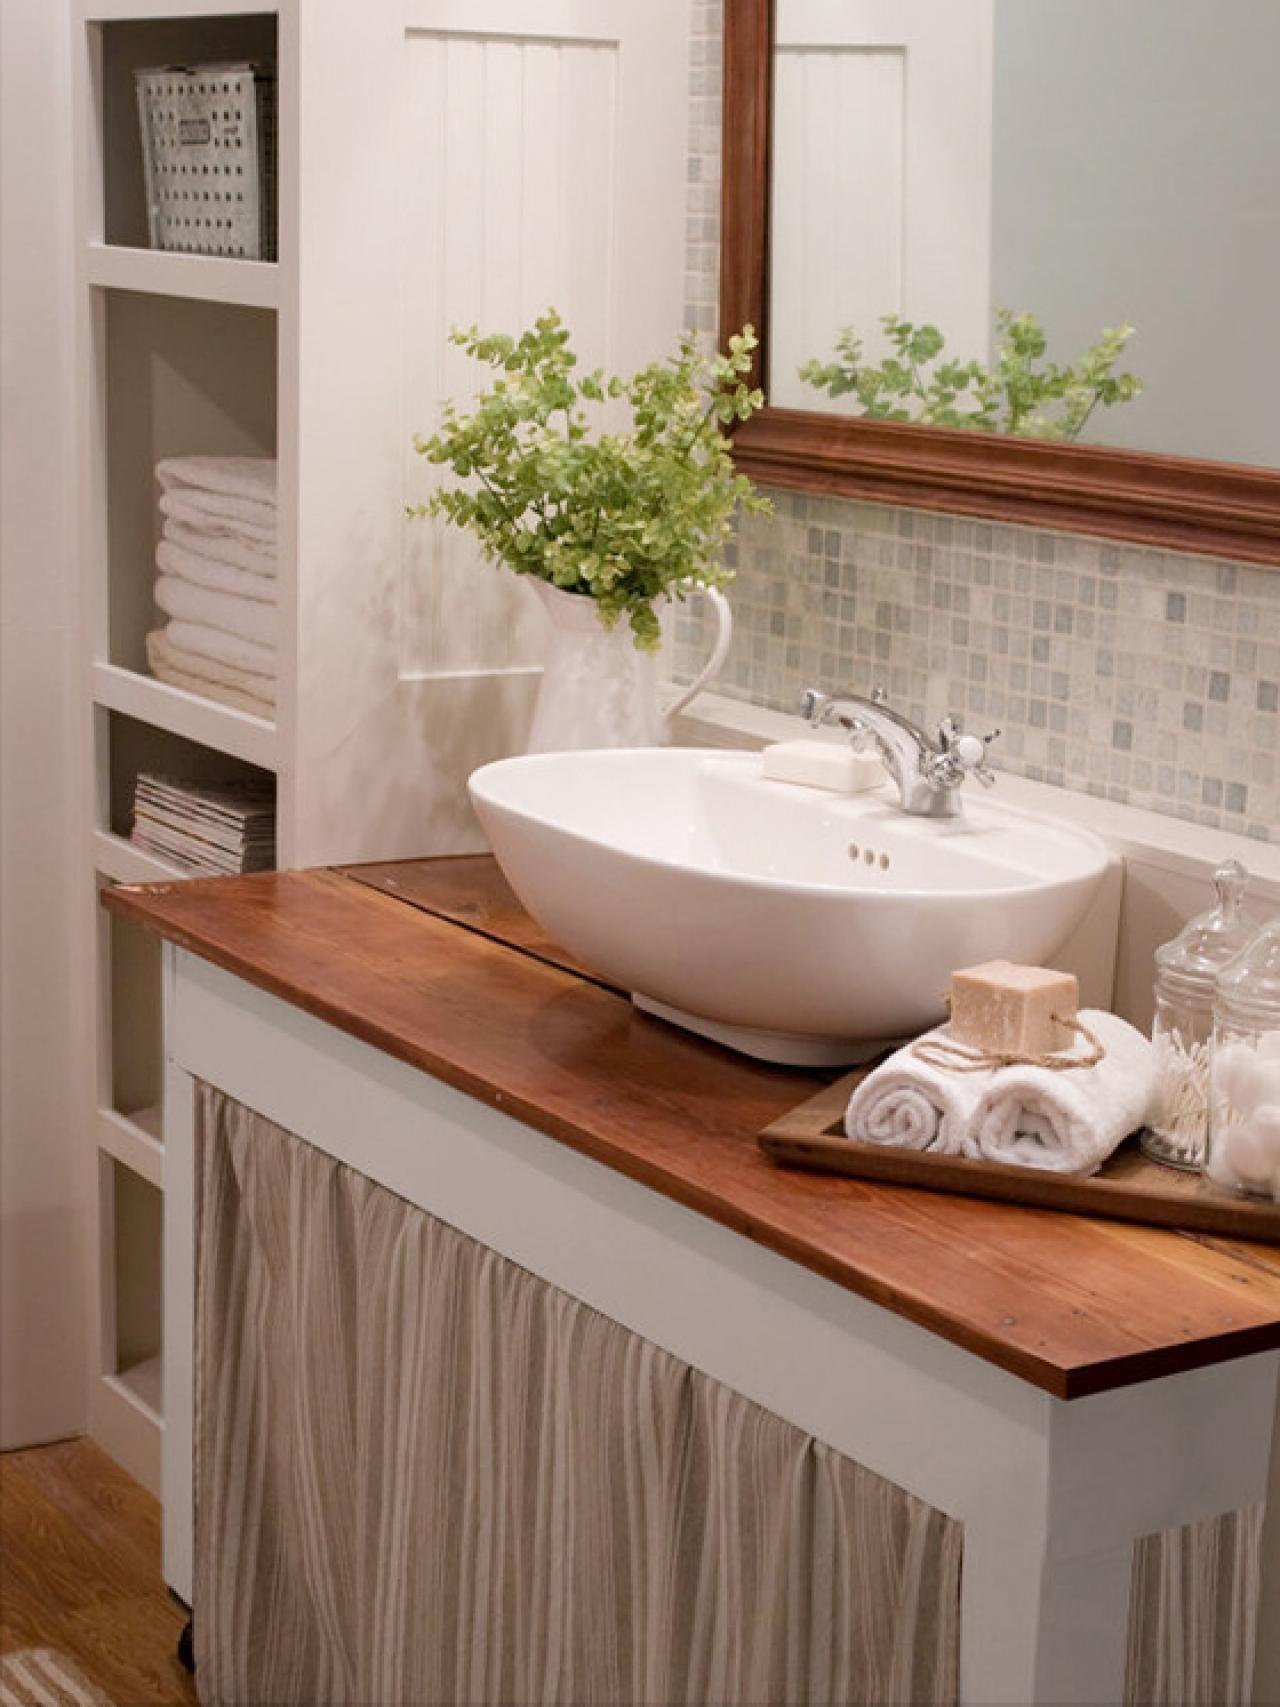 10 Stylish Ideas For Decorating A Bathroom %name 2020